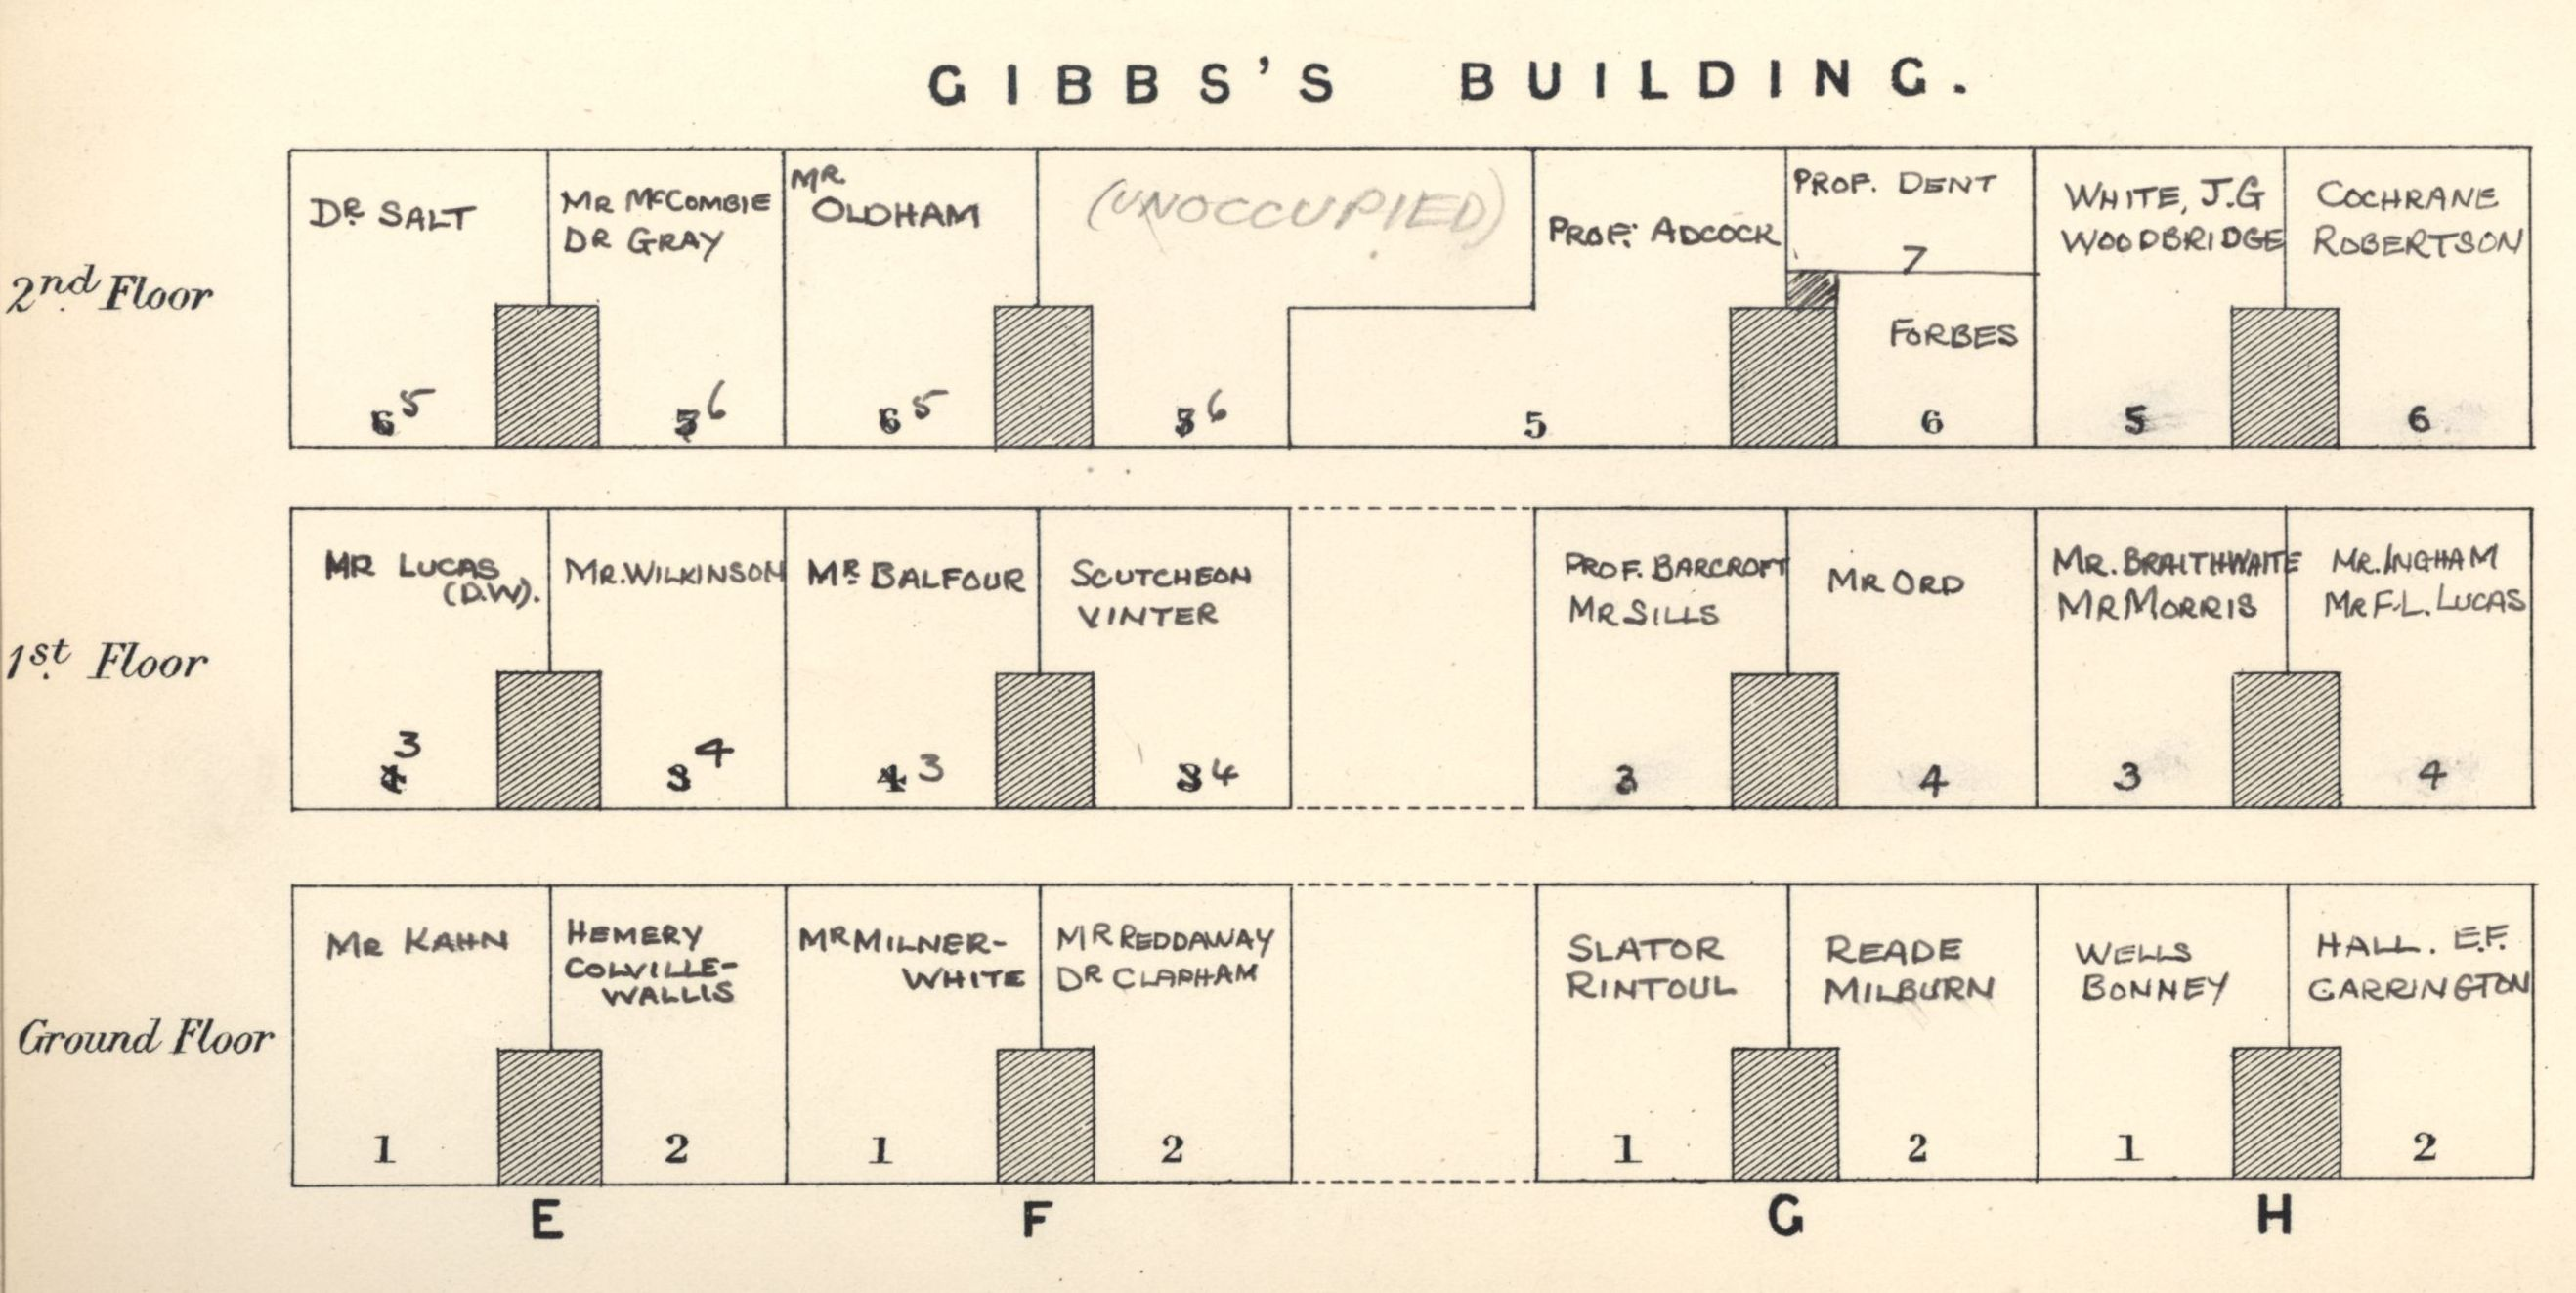 Floor plan, Michaelmas term 1935, showing Dent in G7, greatly reducing his space.